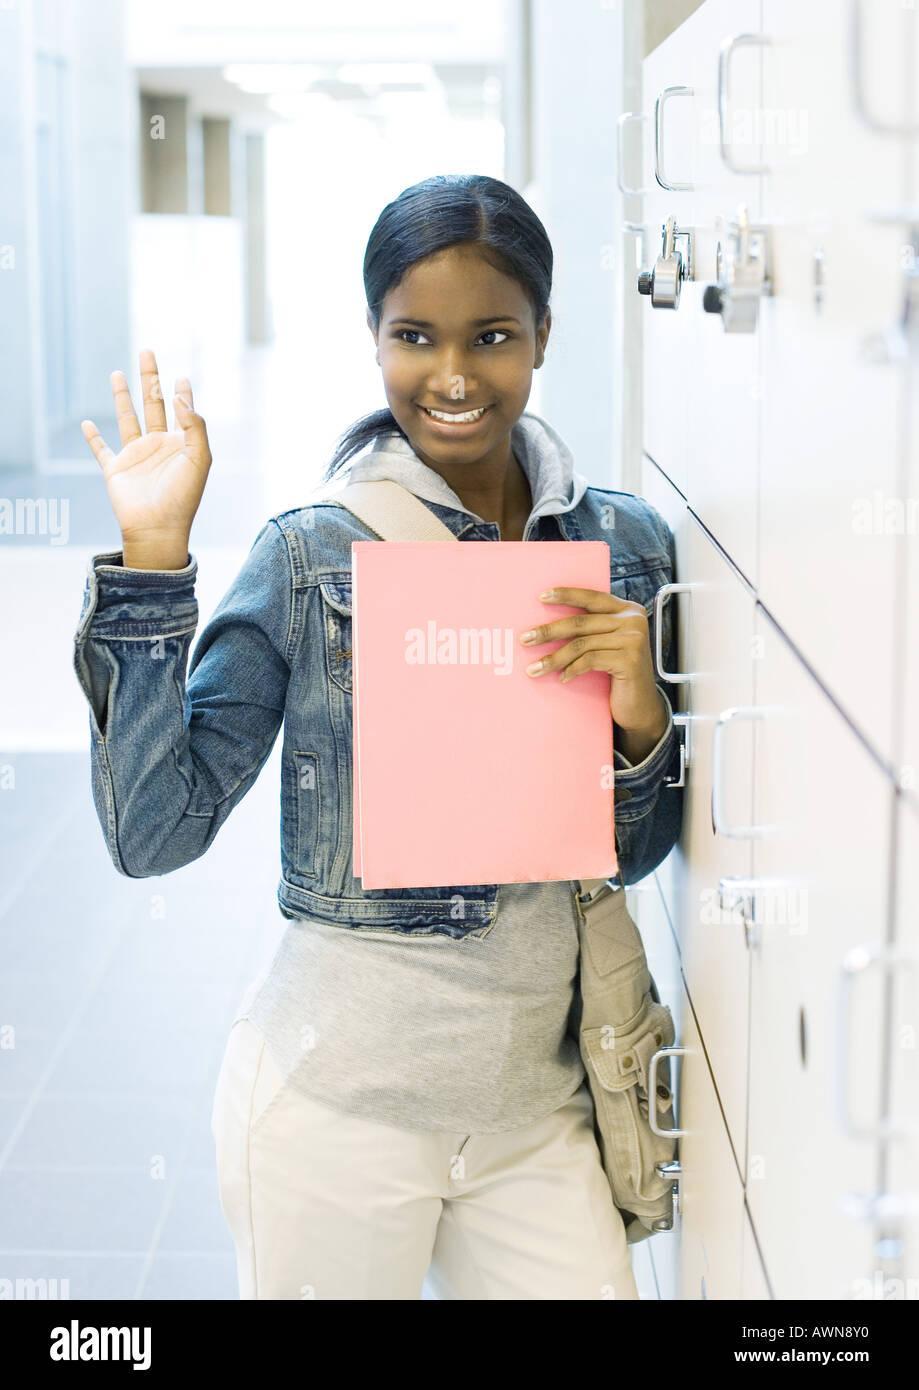 Teen girl standing by locker - Stock Image